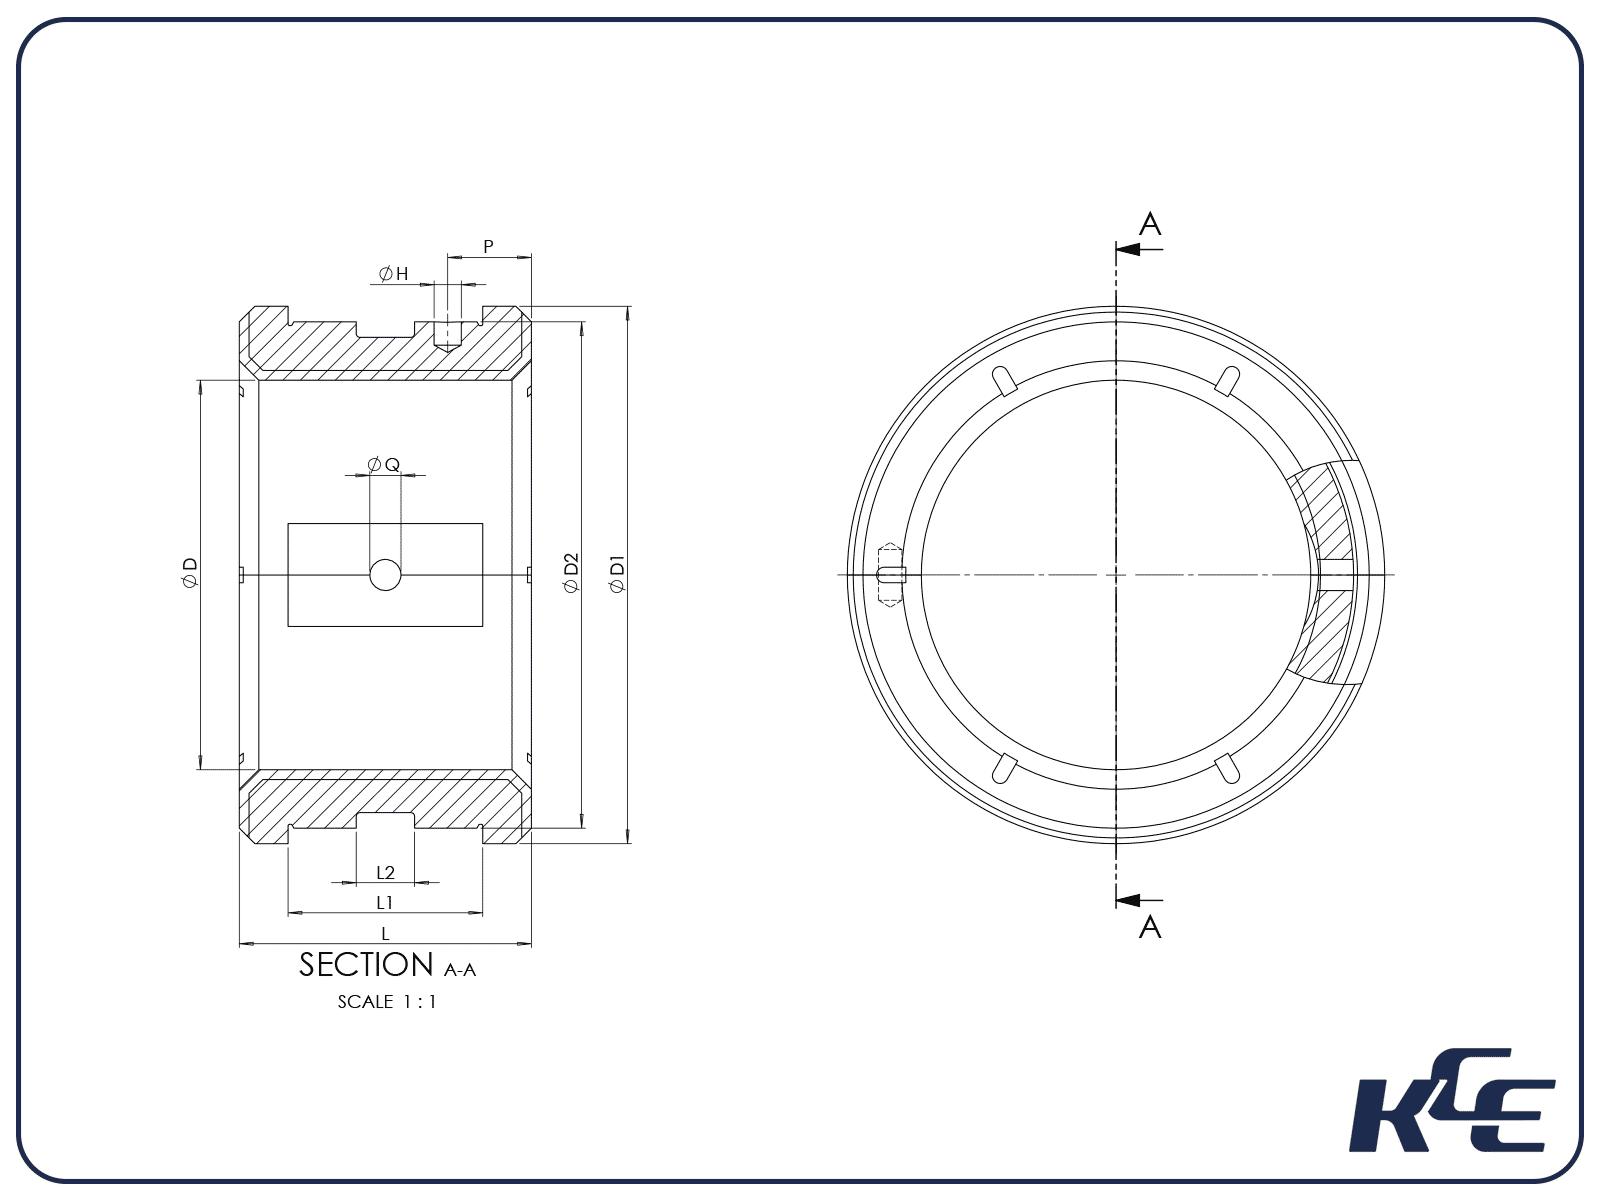 Locating Journal Bearings - C Series